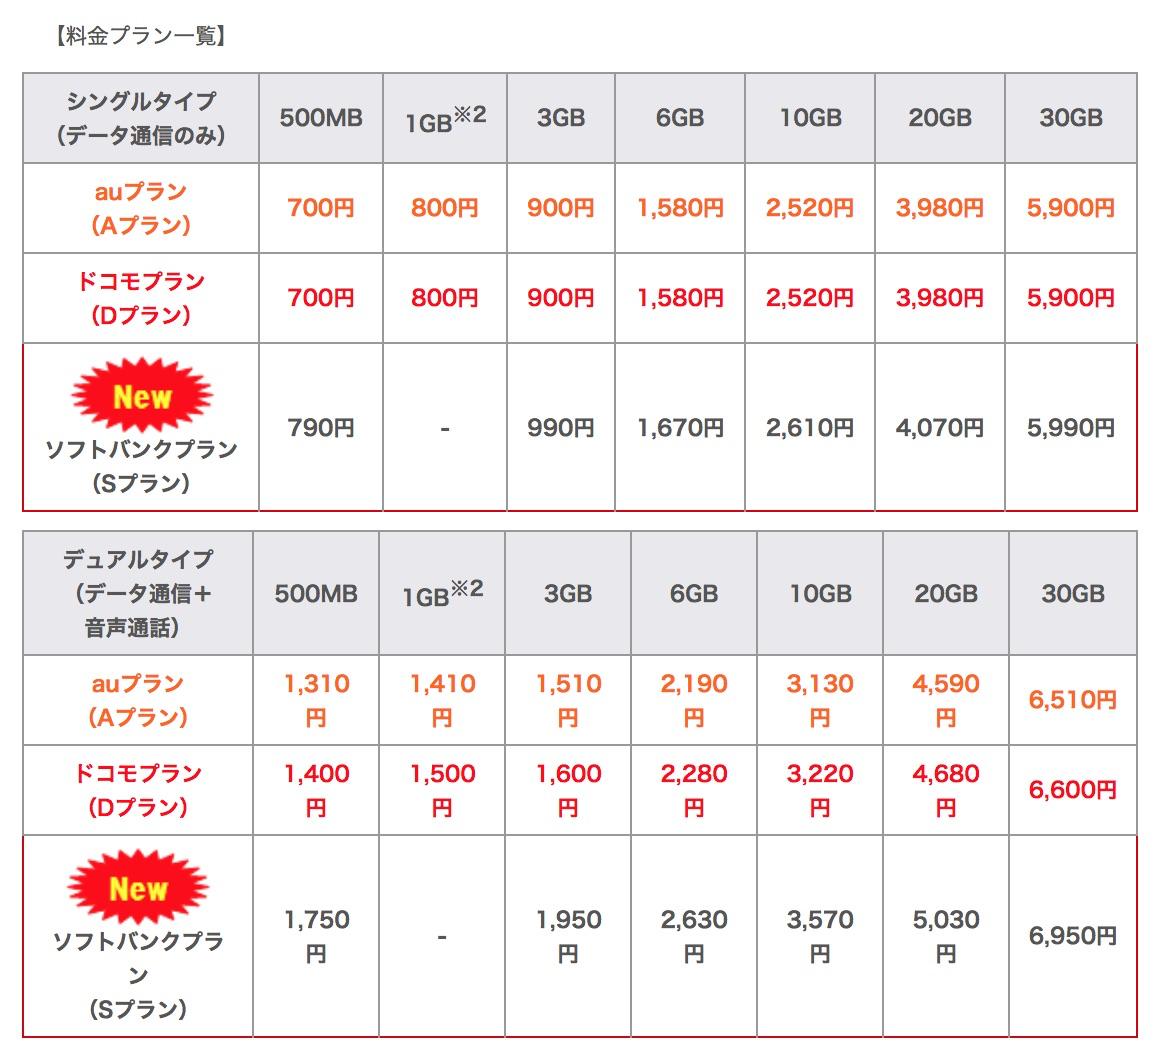 auプラン/ドコモプラン/ソフトバンクプランの料金比較